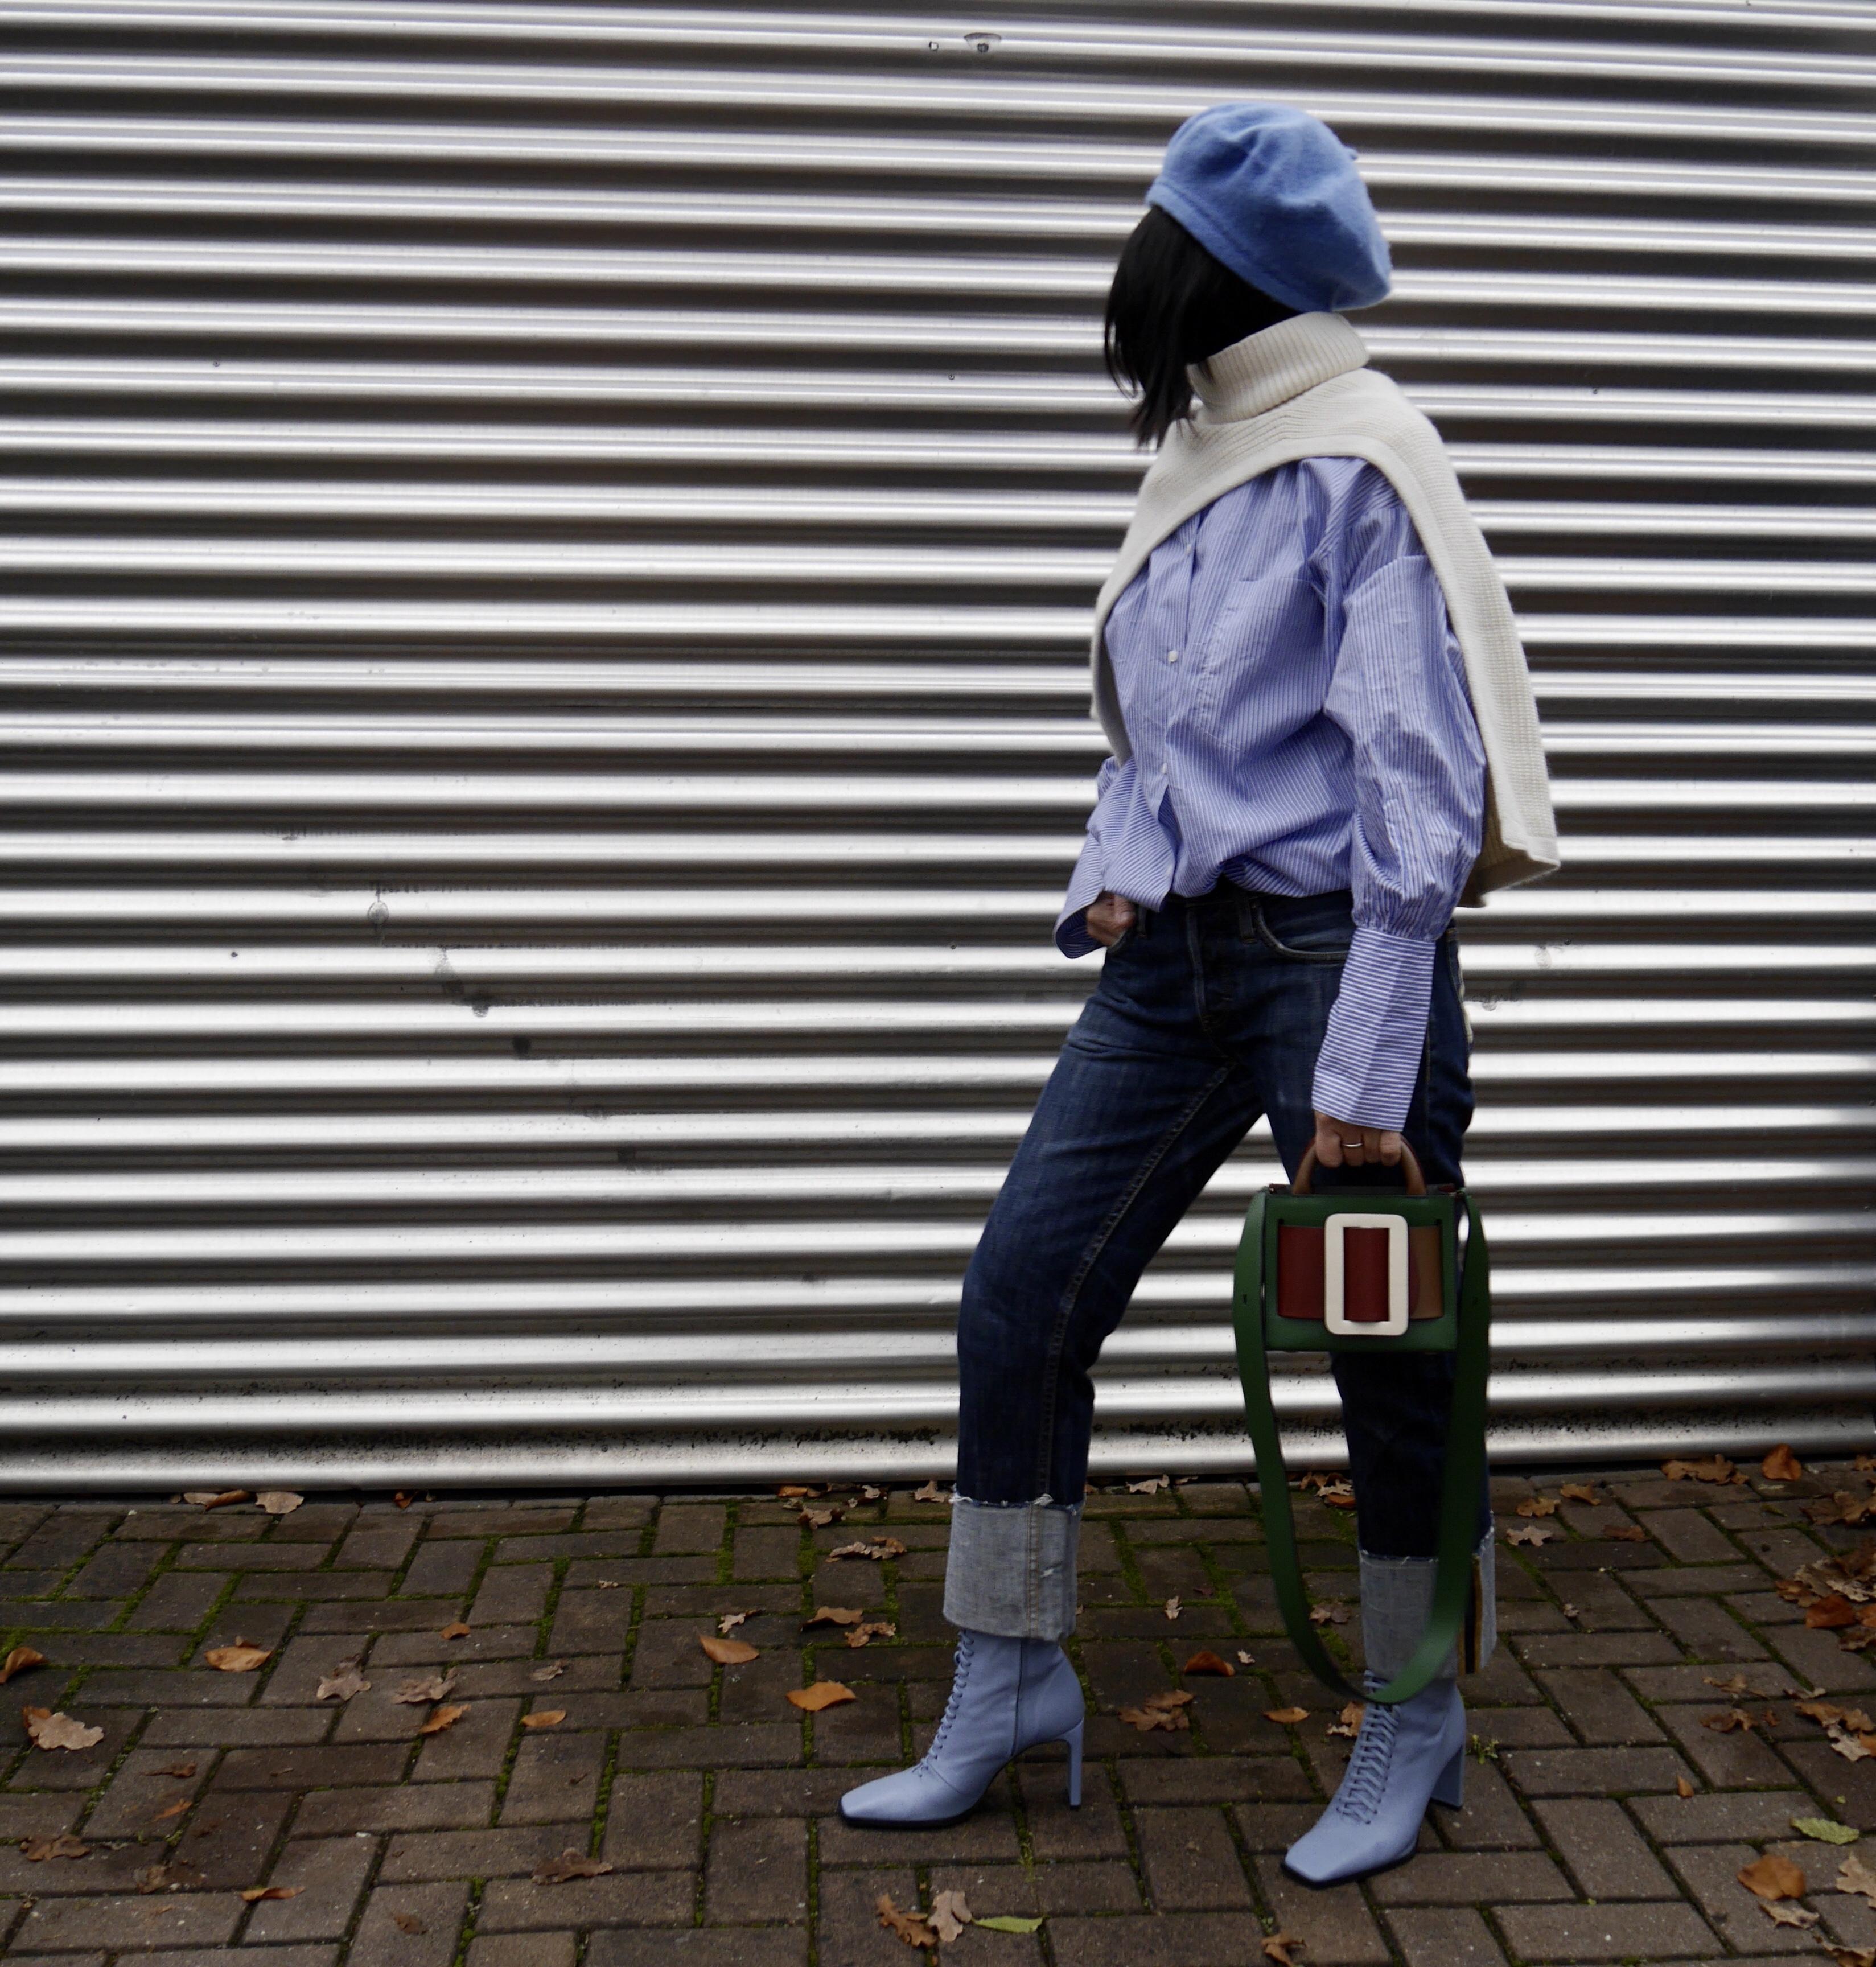 Pullunder über Oversize-Hemd, Jeans umgeschlagen